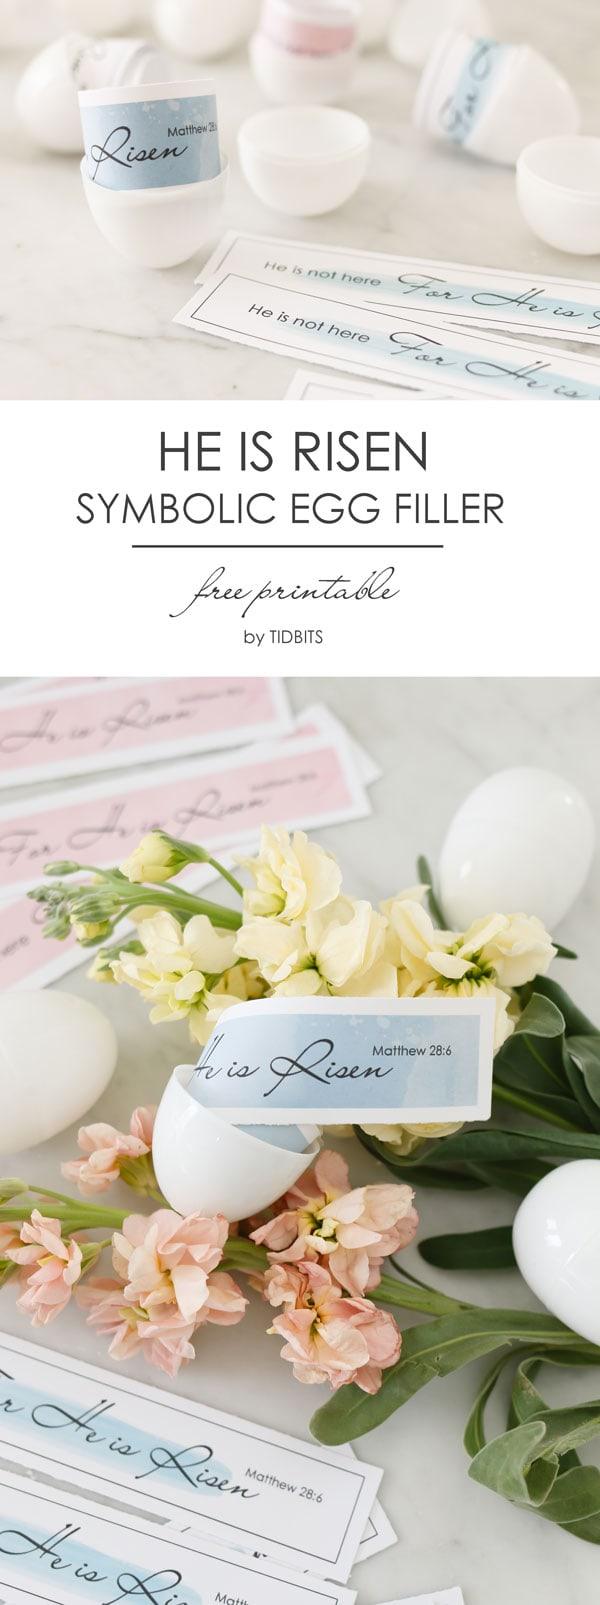 He is Risen Free Printable - symbolic egg filler for Easter.